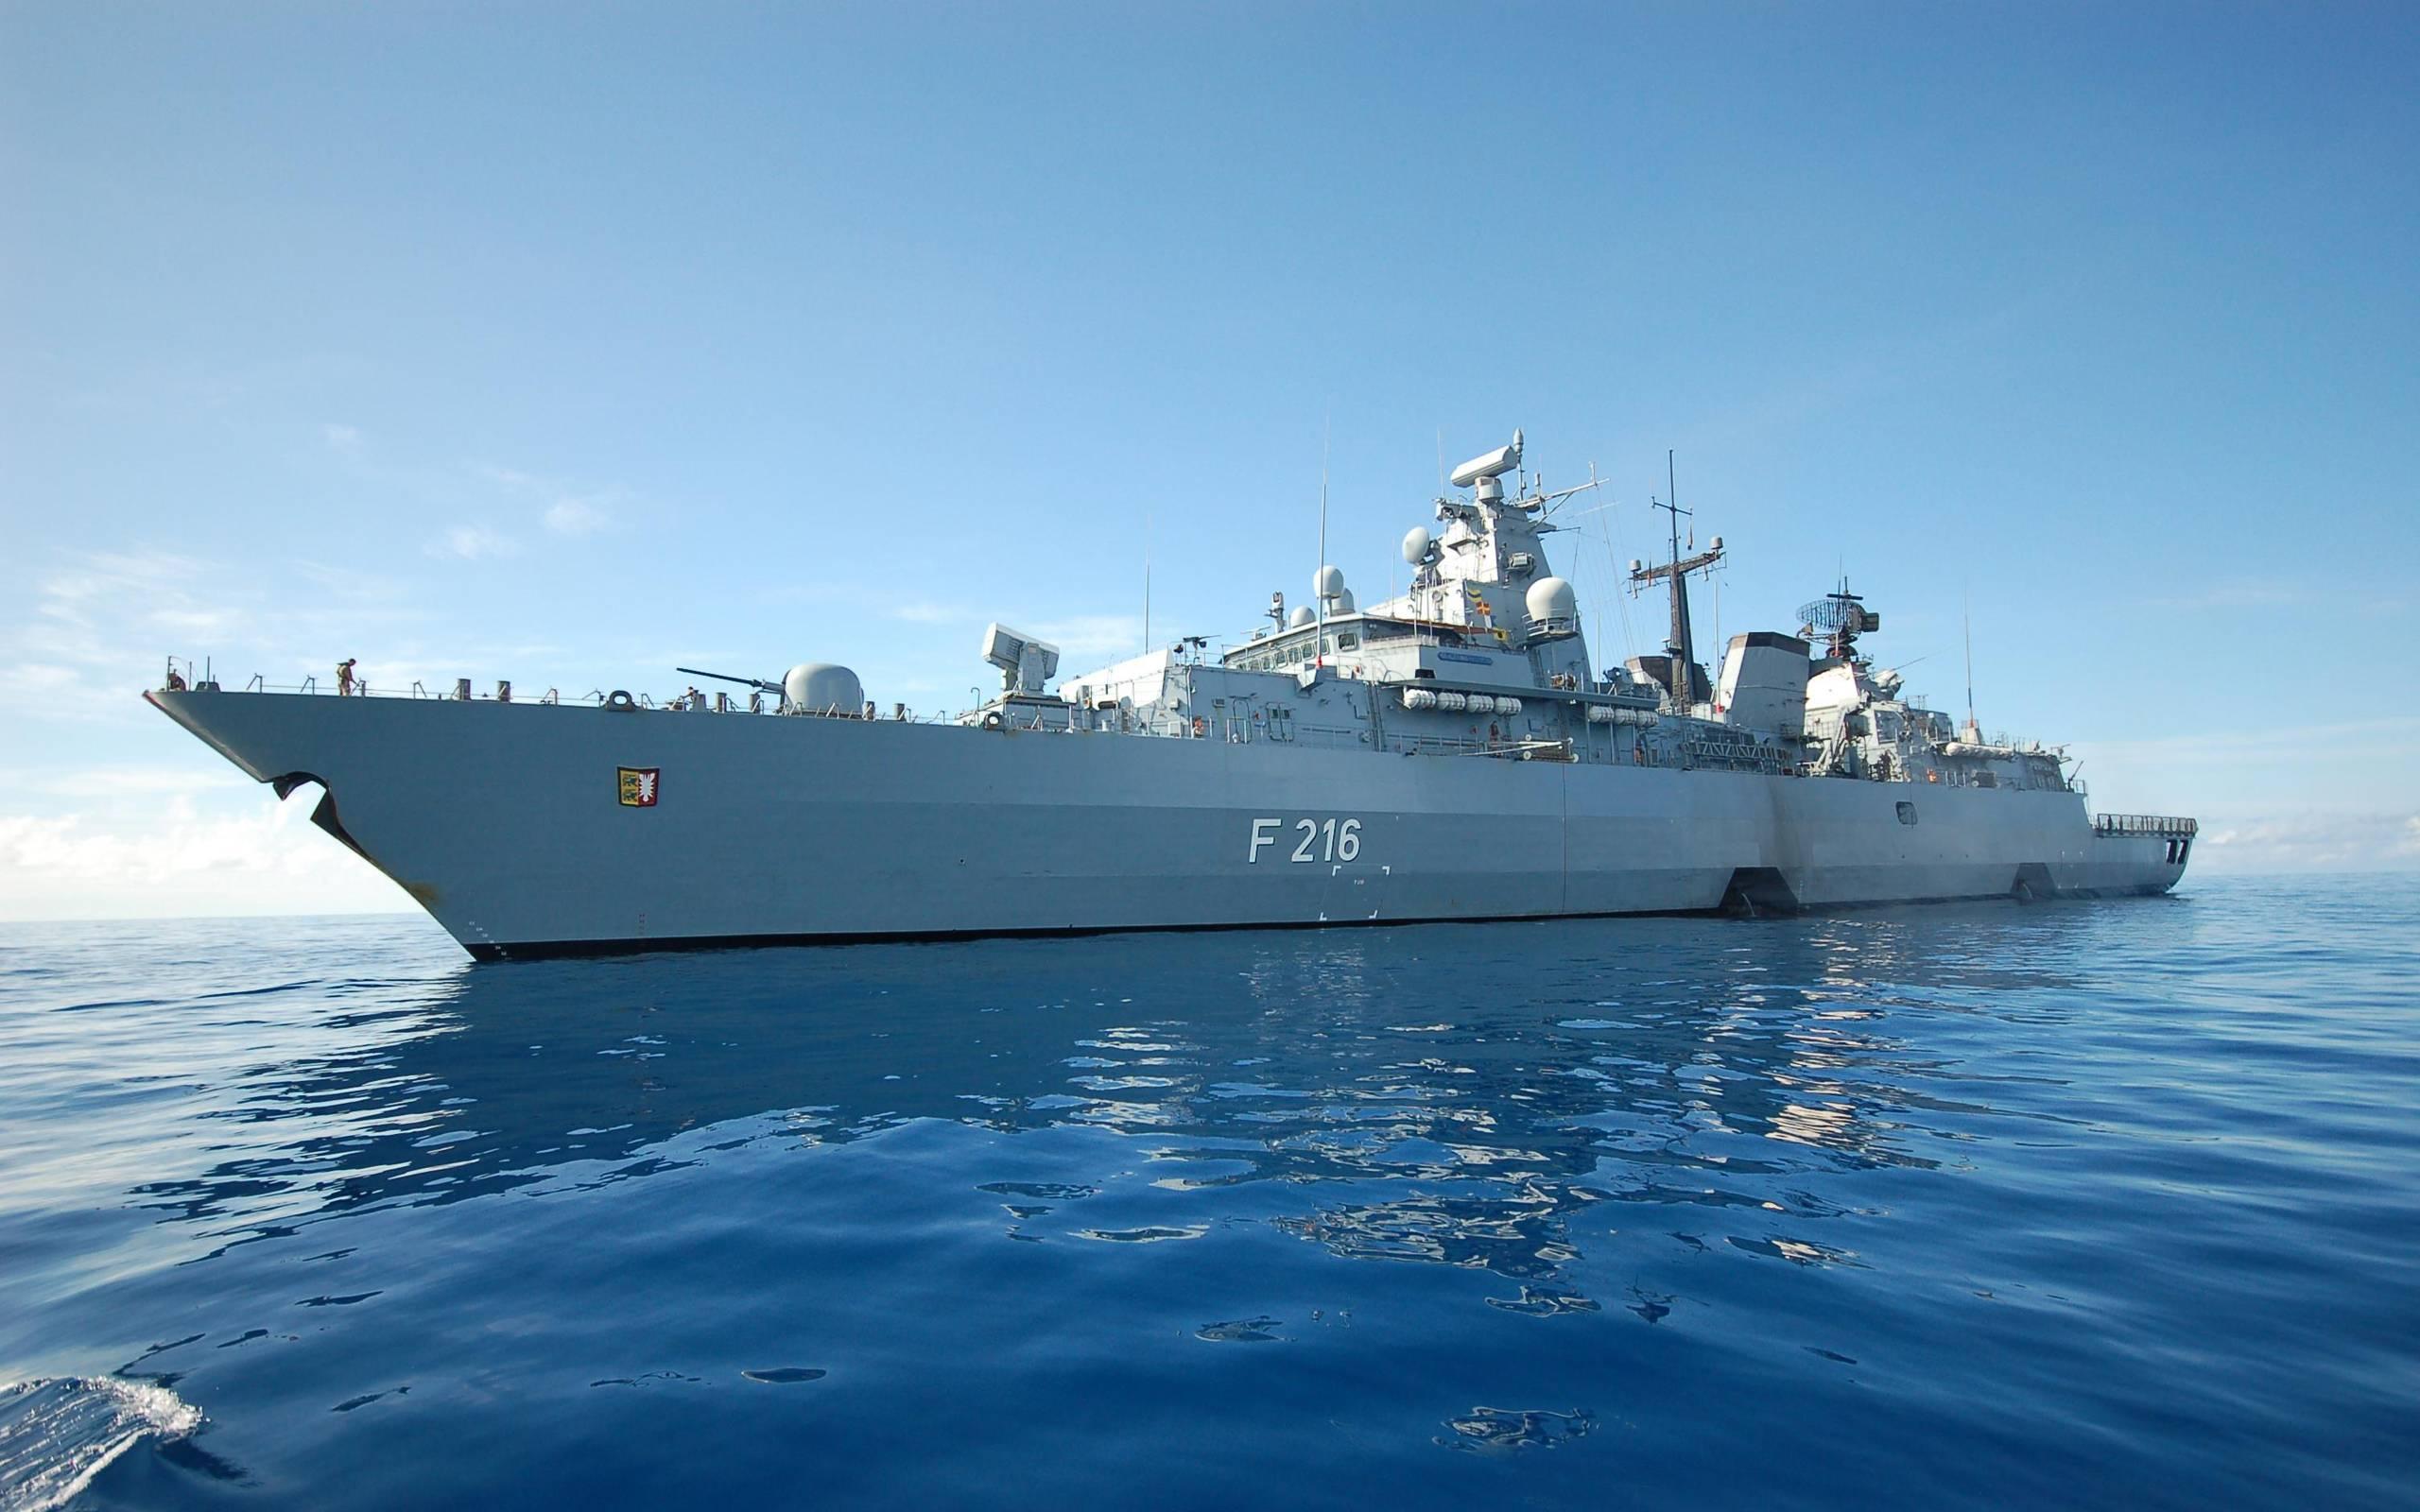 navy wallpaper 1440x900 ships - photo #13